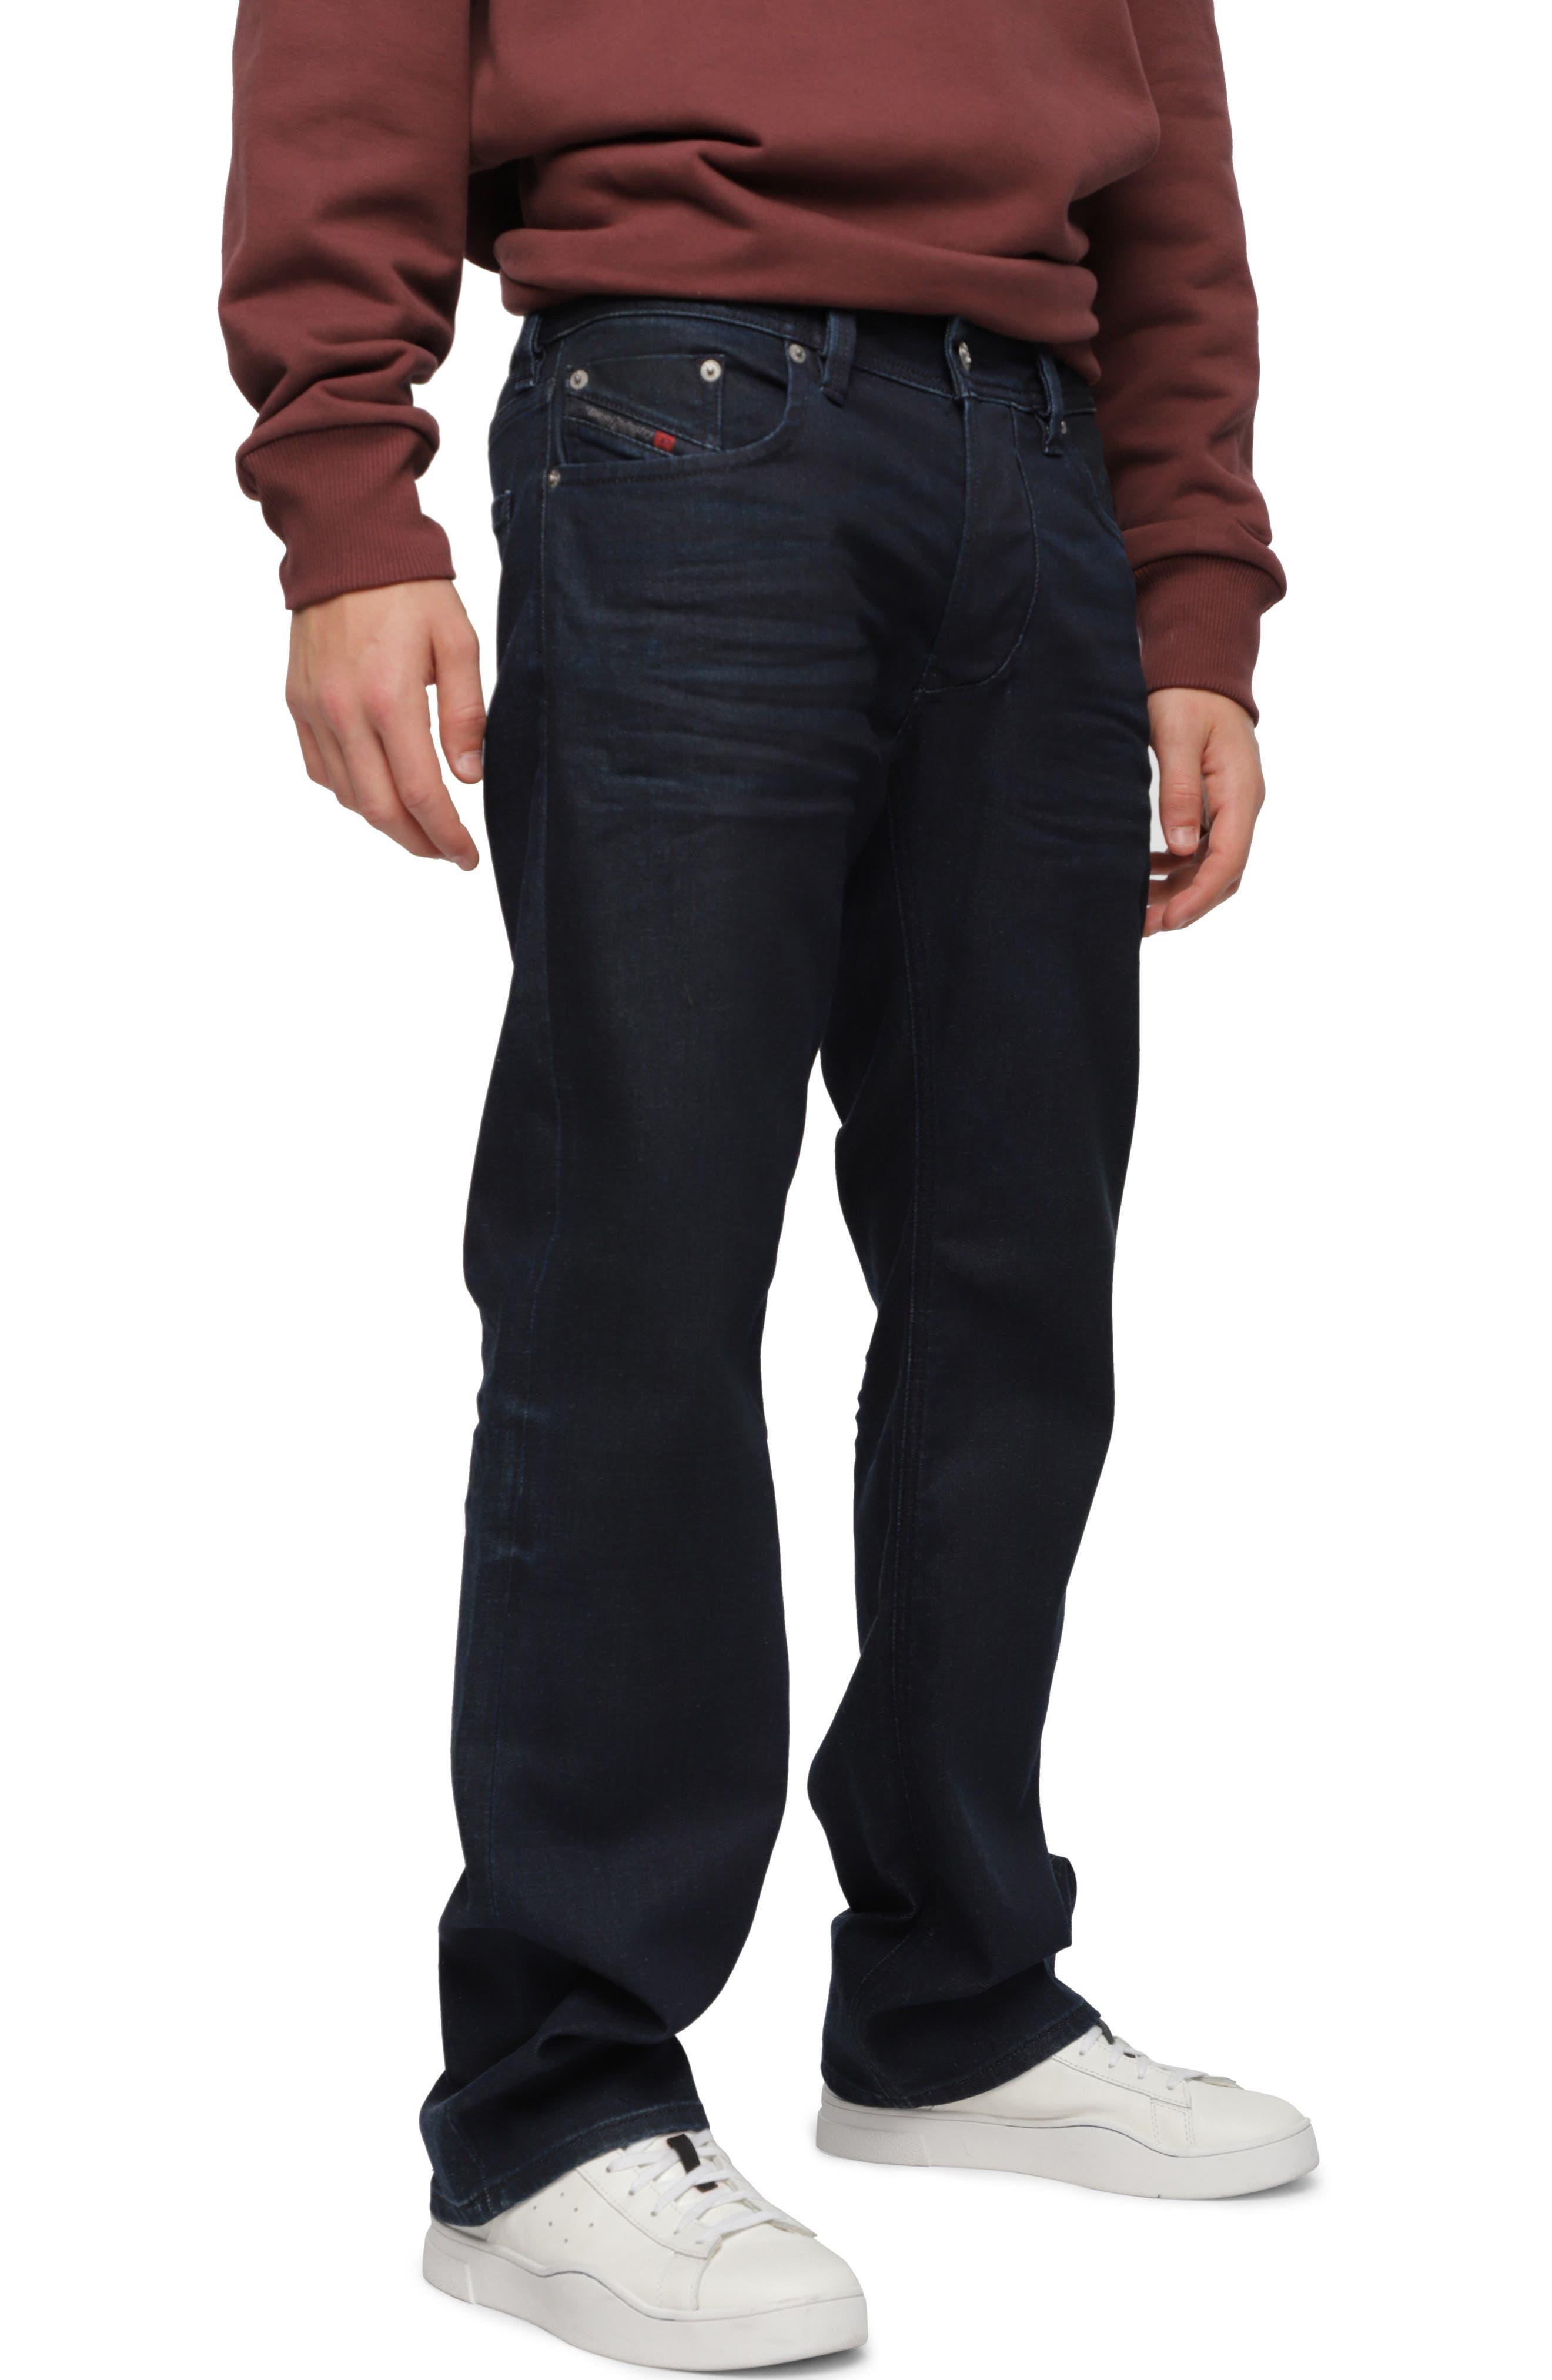 Larkee Relaxed Straight Leg Jeans,                             Main thumbnail 1, color,                             C84ZC